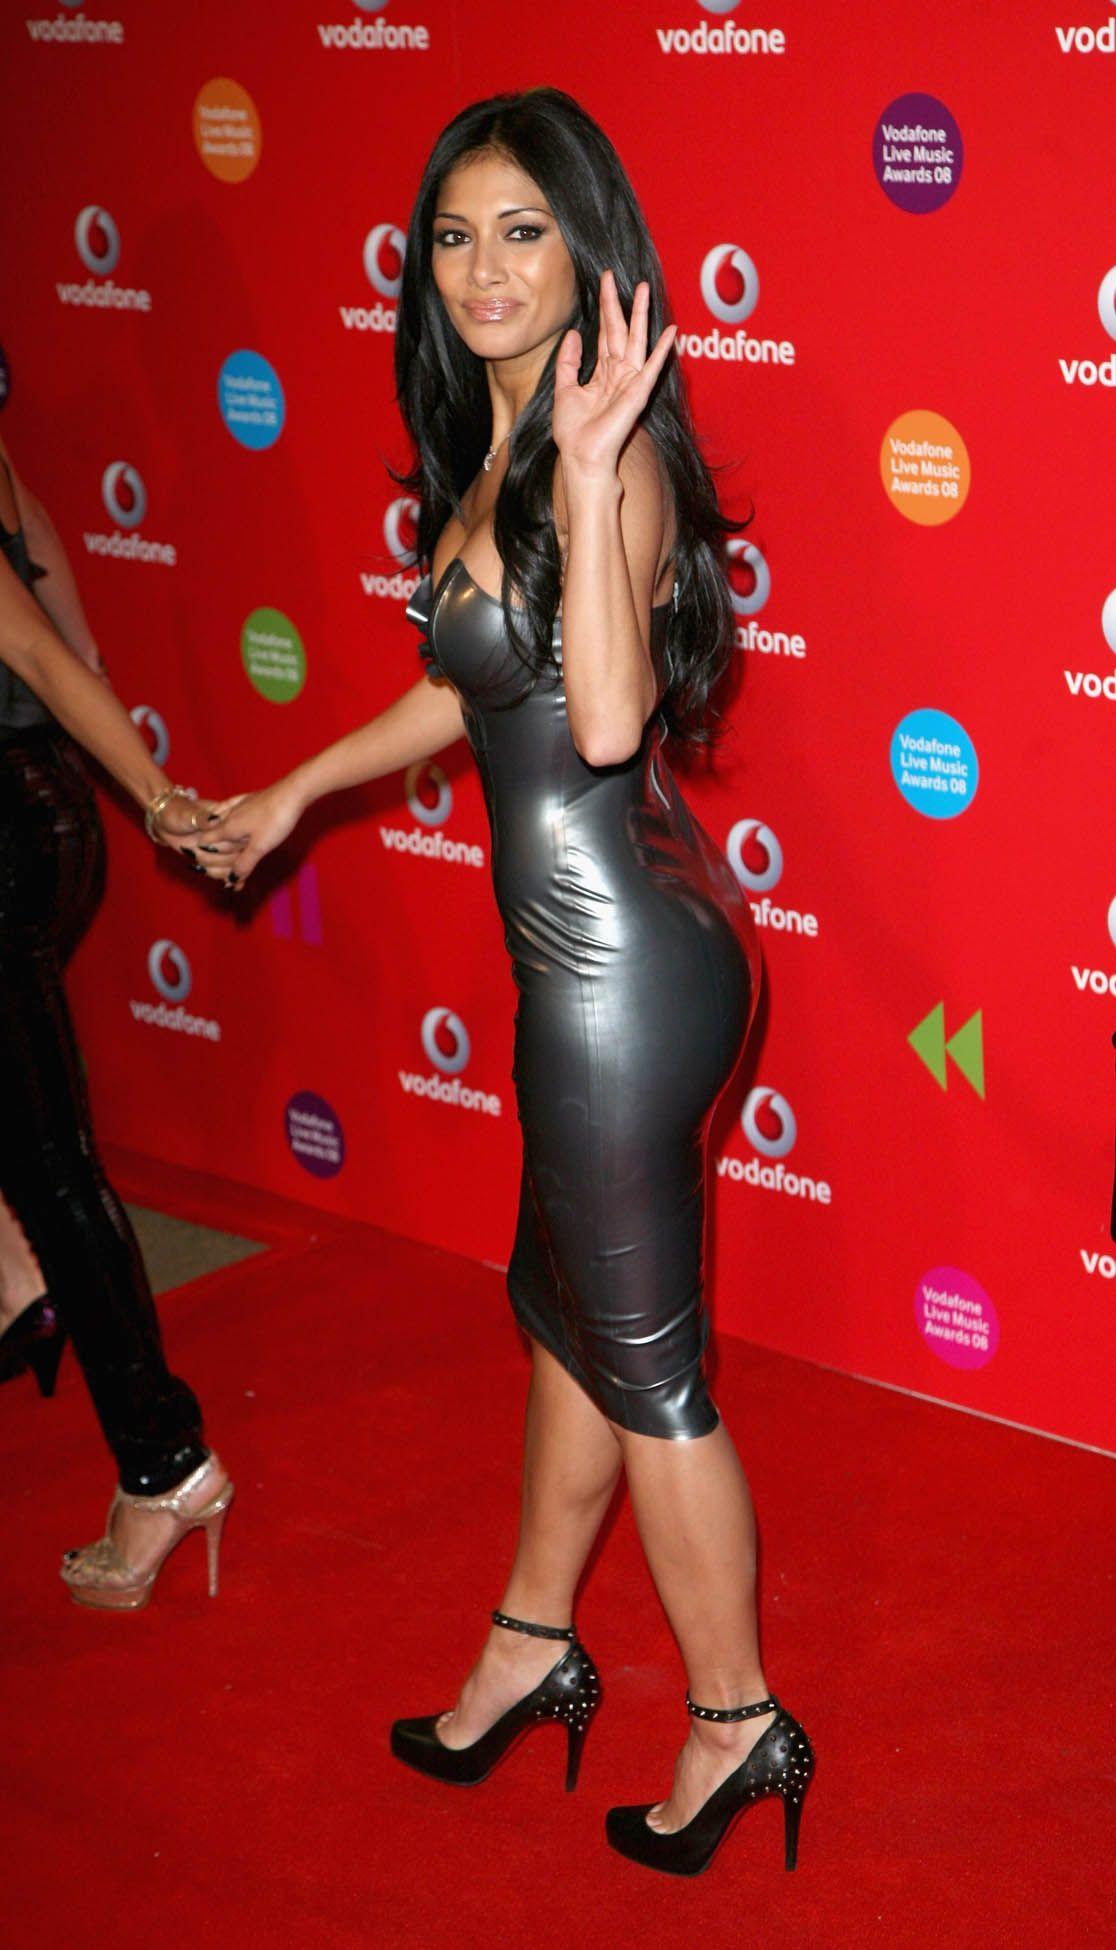 Girls In Ridiculously Tight Dressesneed I Say More 39 Photos Nicole ScherzingerNicole